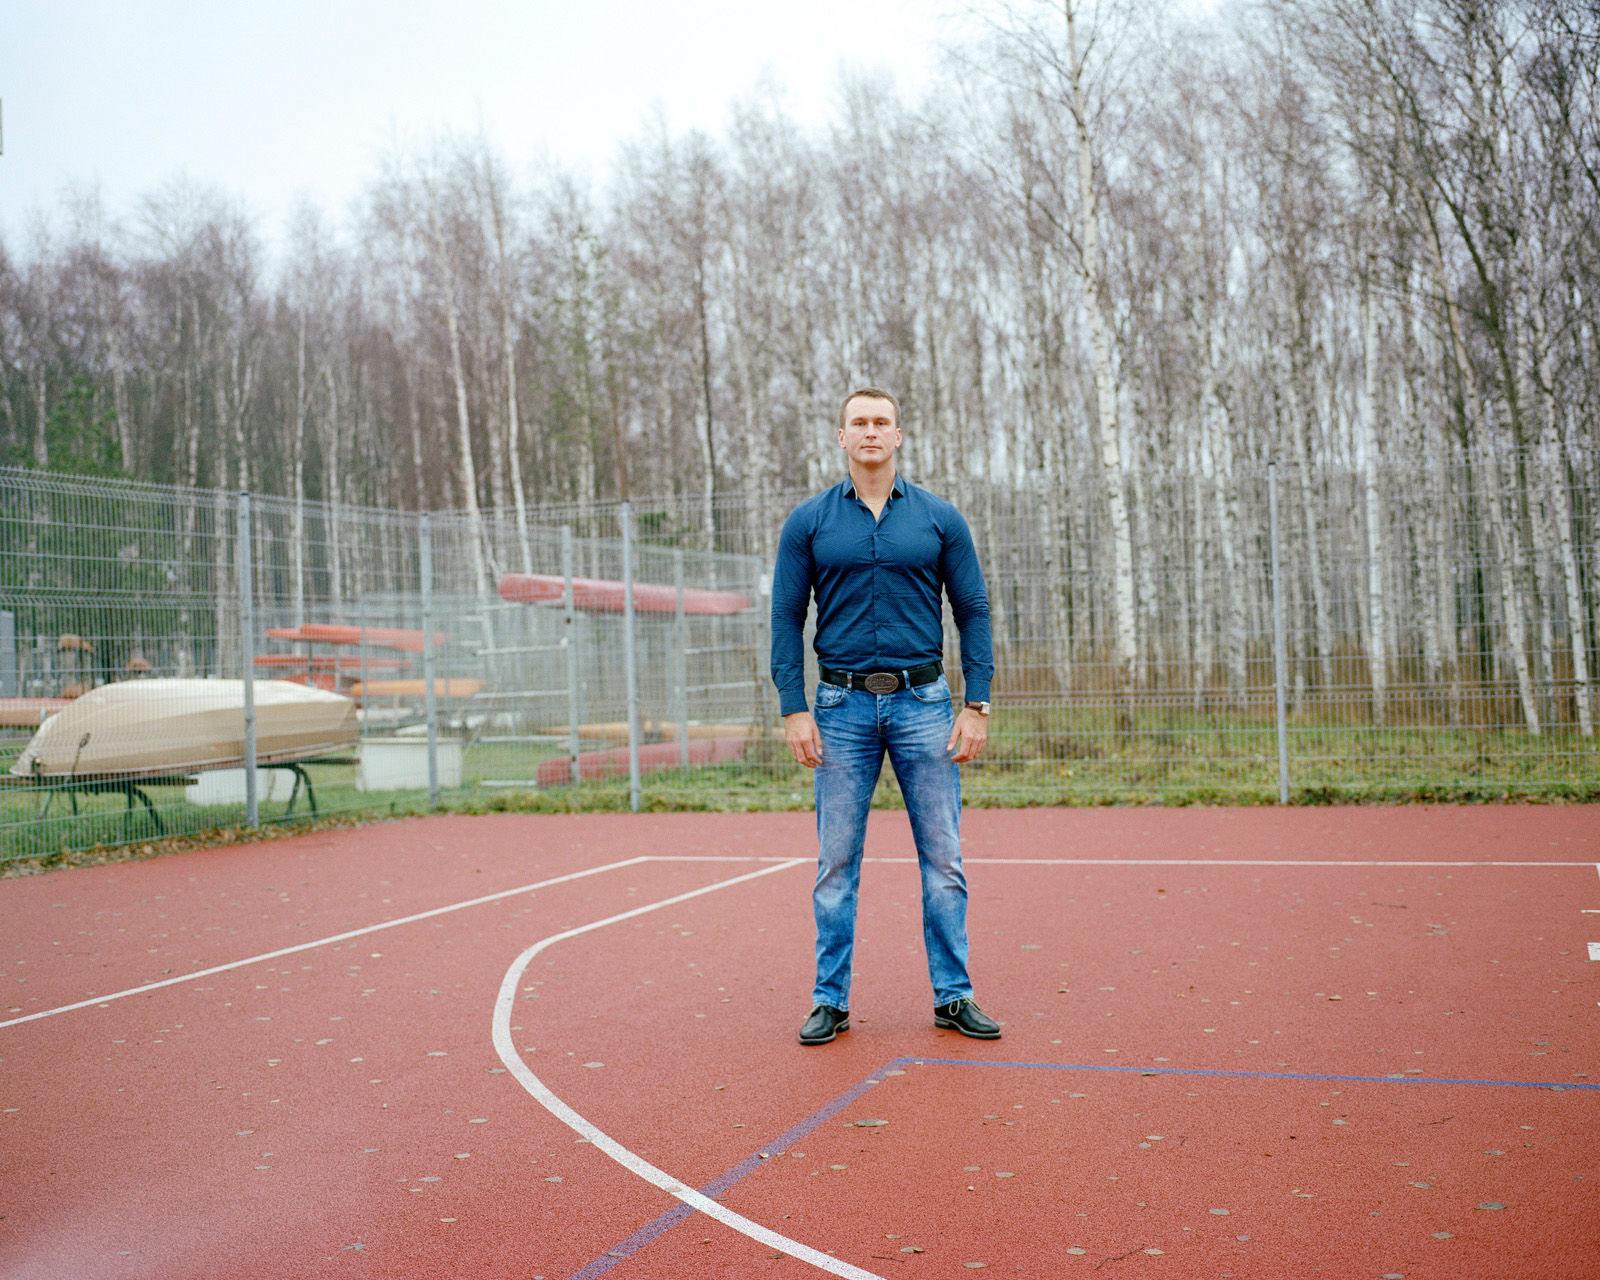 Евгений Шуклин, 31-летний спортсмен и член городского совета